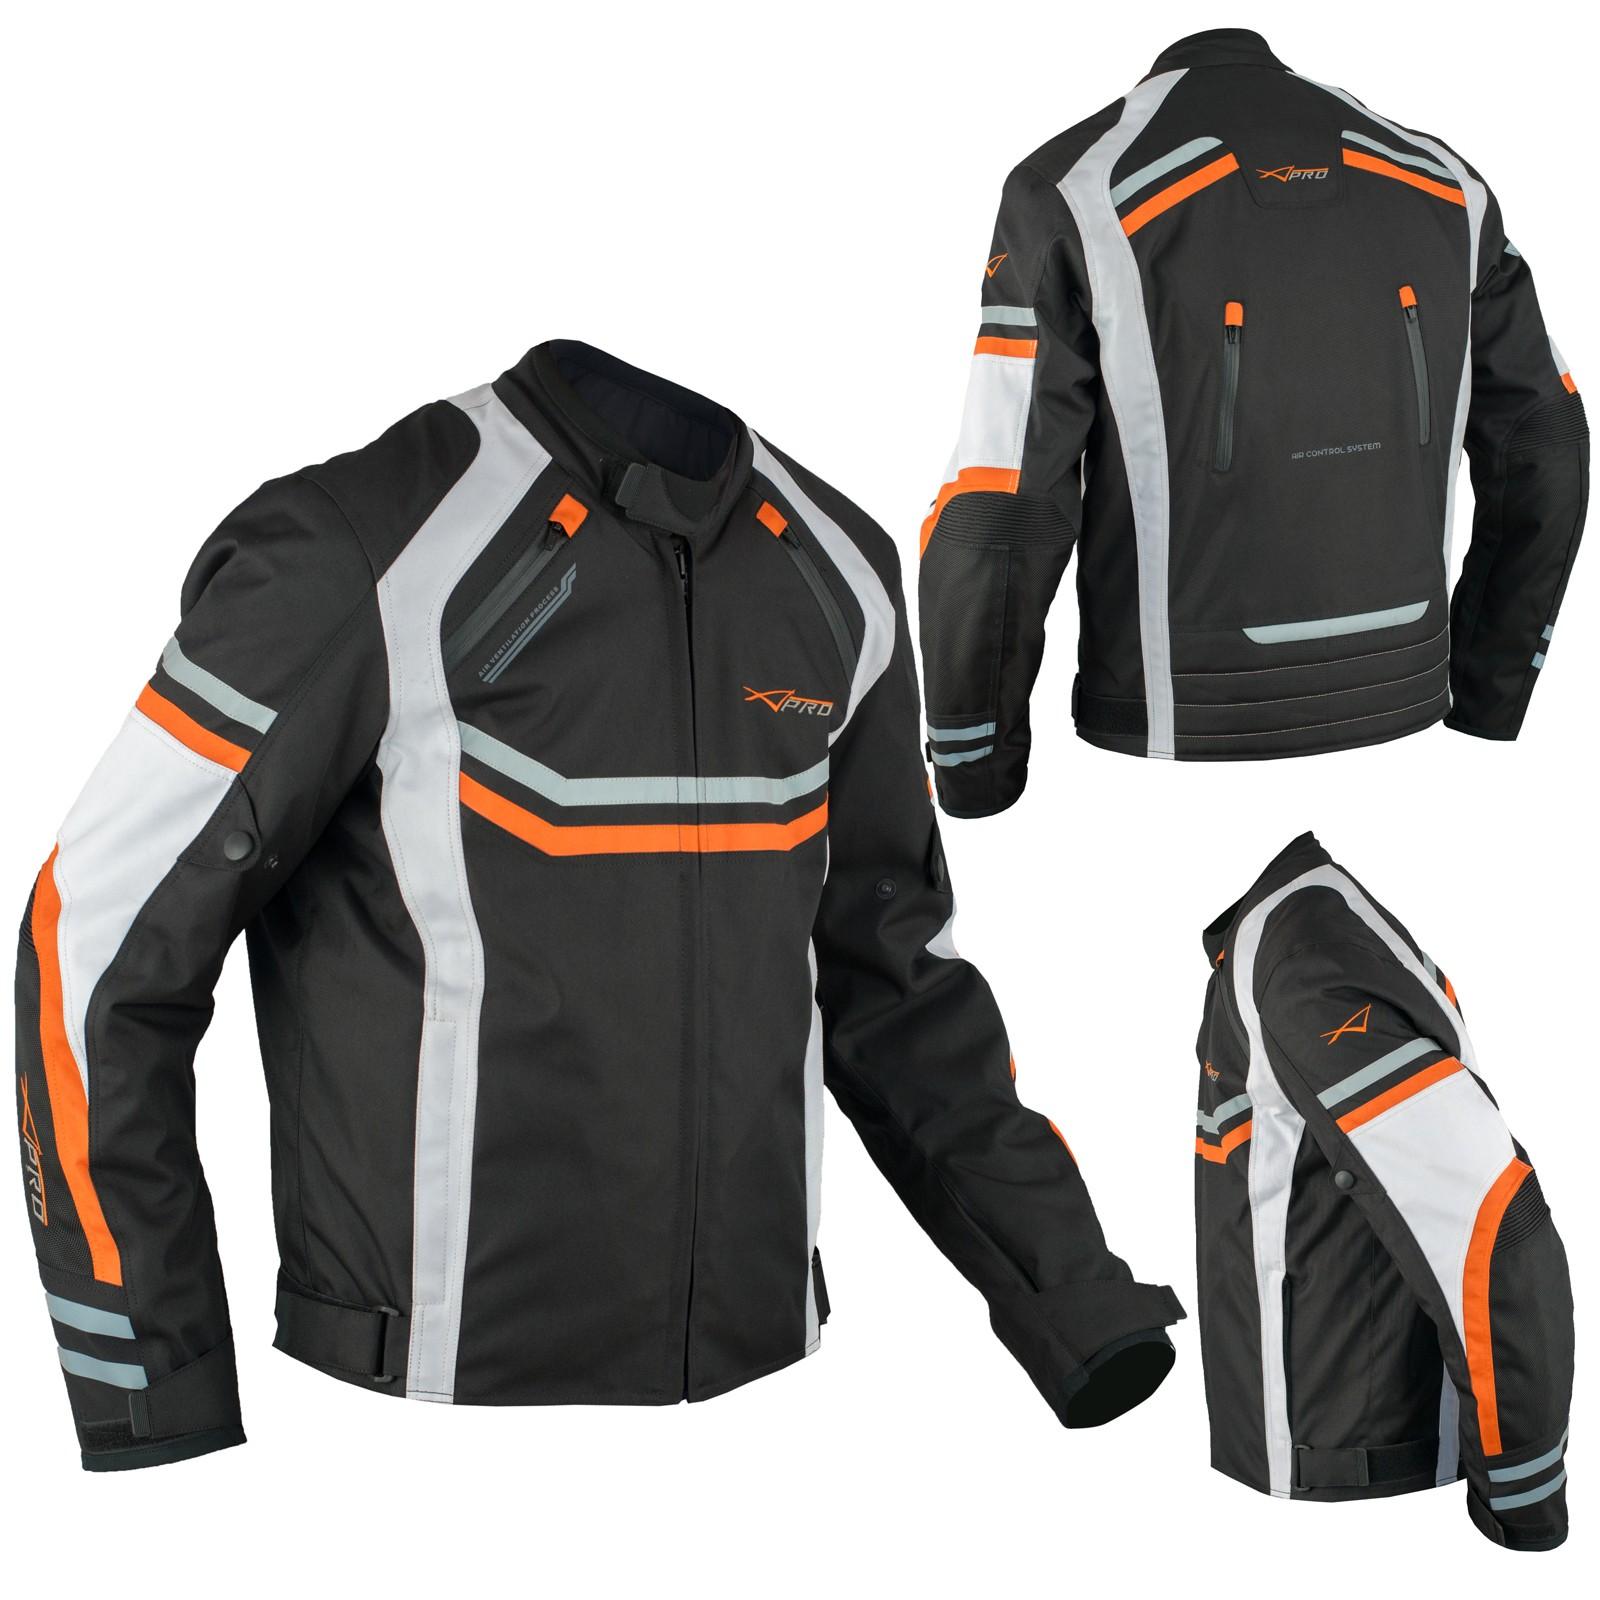 Protections Sport Ce Impermeable Blouson Traspirant Orange Textile Moto bygYf76